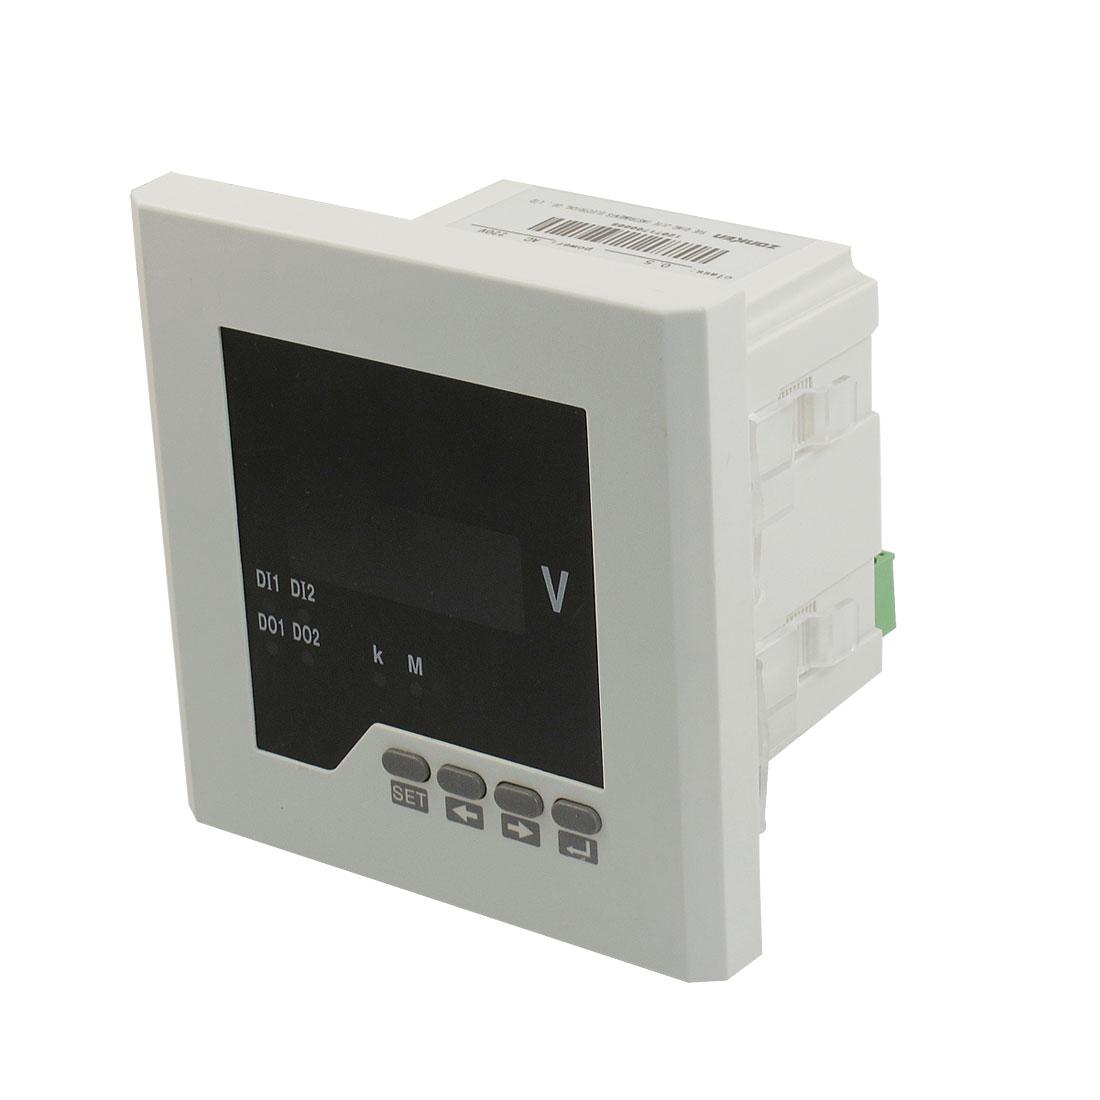 ZK-AV21 AC 220V 86 x 86mm Cutout 4 Digits Red LED Display Volt Meter